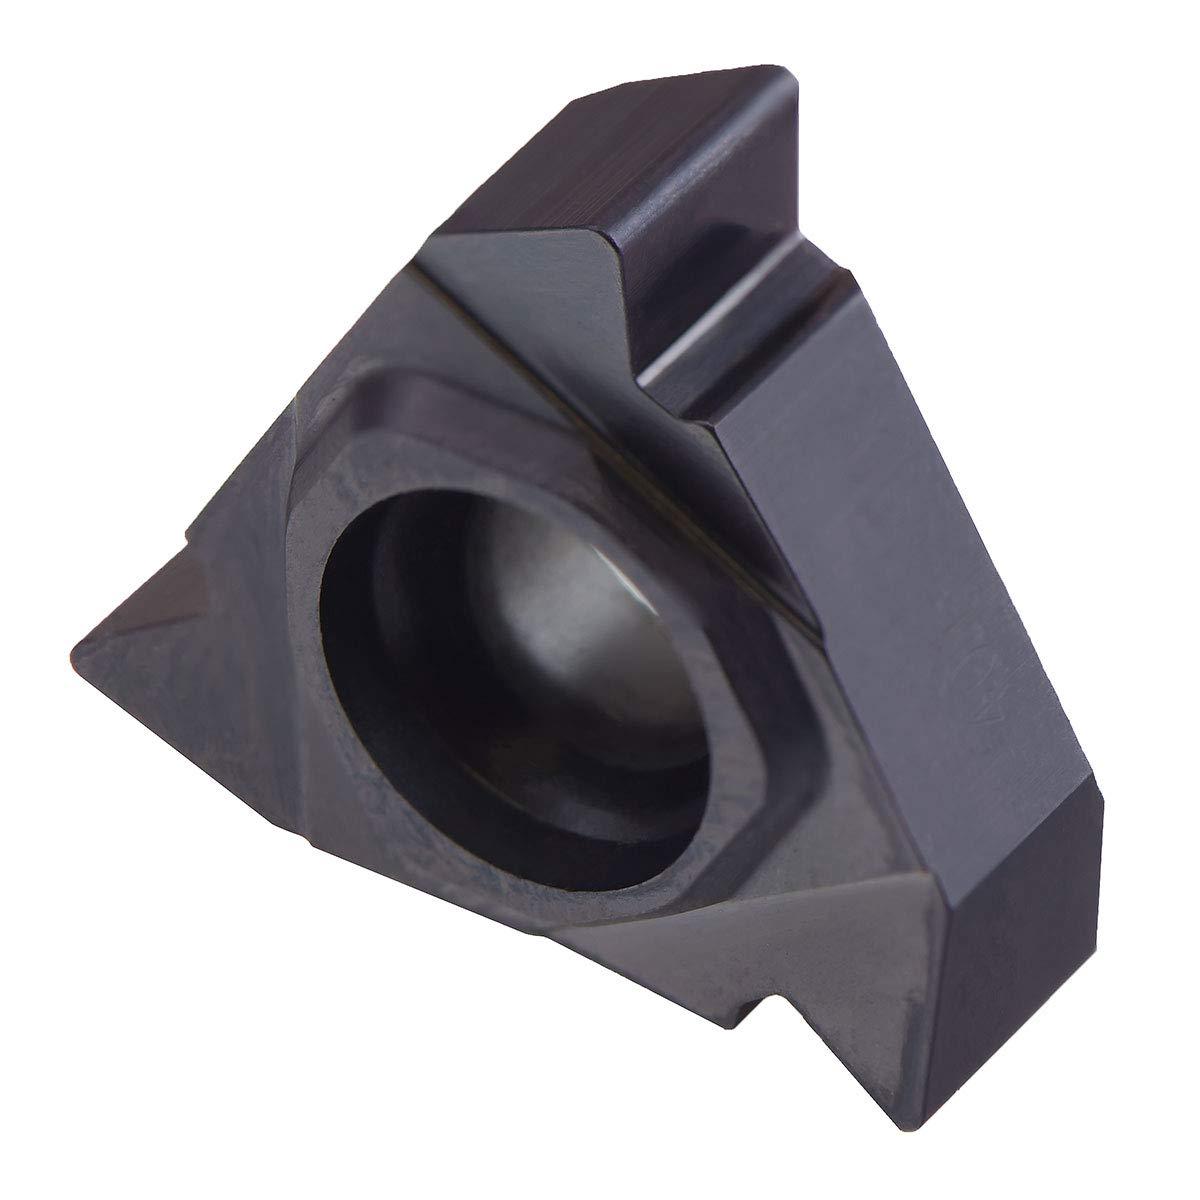 12 TPI Carbide TIALN-Coated; 16ER12UN-A02 MAXTOOL 2PCs 16ER12UN External American UN Full Profile Indexable Threading Inserts 3//8 I.C